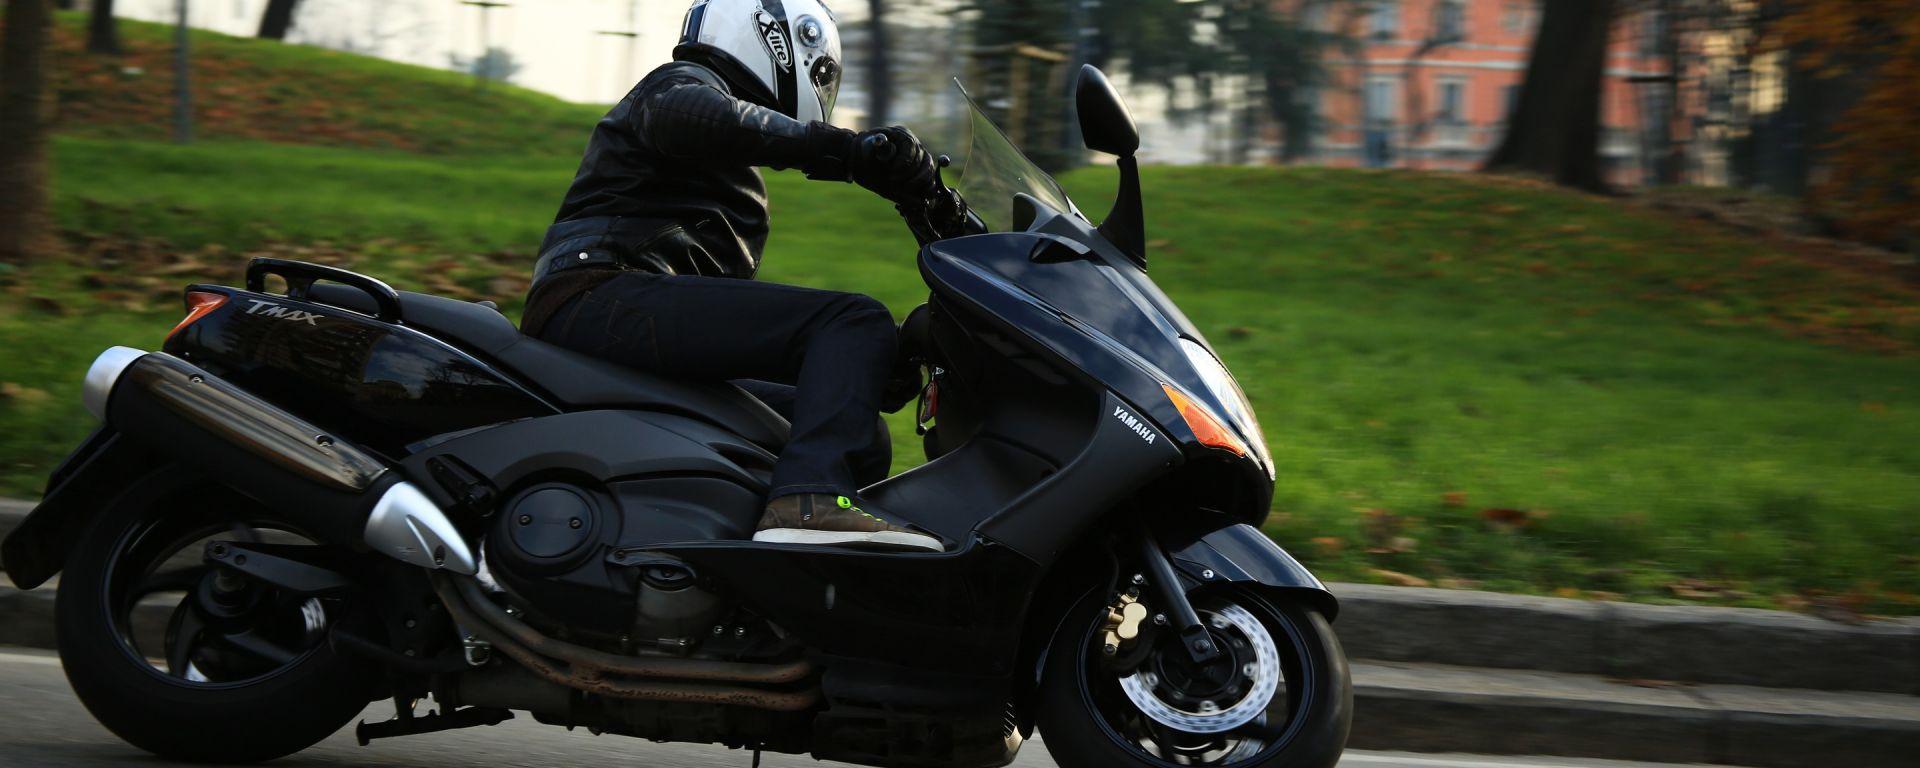 Guidare lo Yamaha TMax